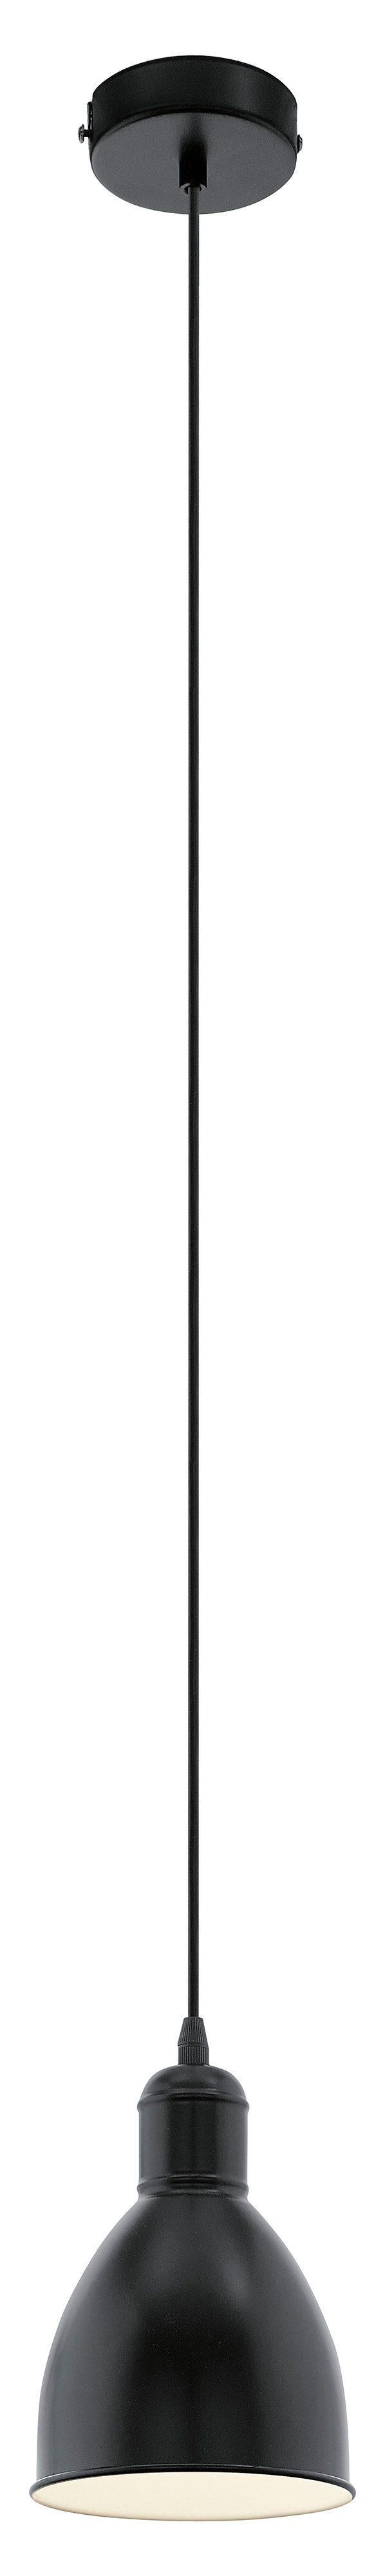 EGLO Pendelleuchte »PRIDDY«, 1-flammig